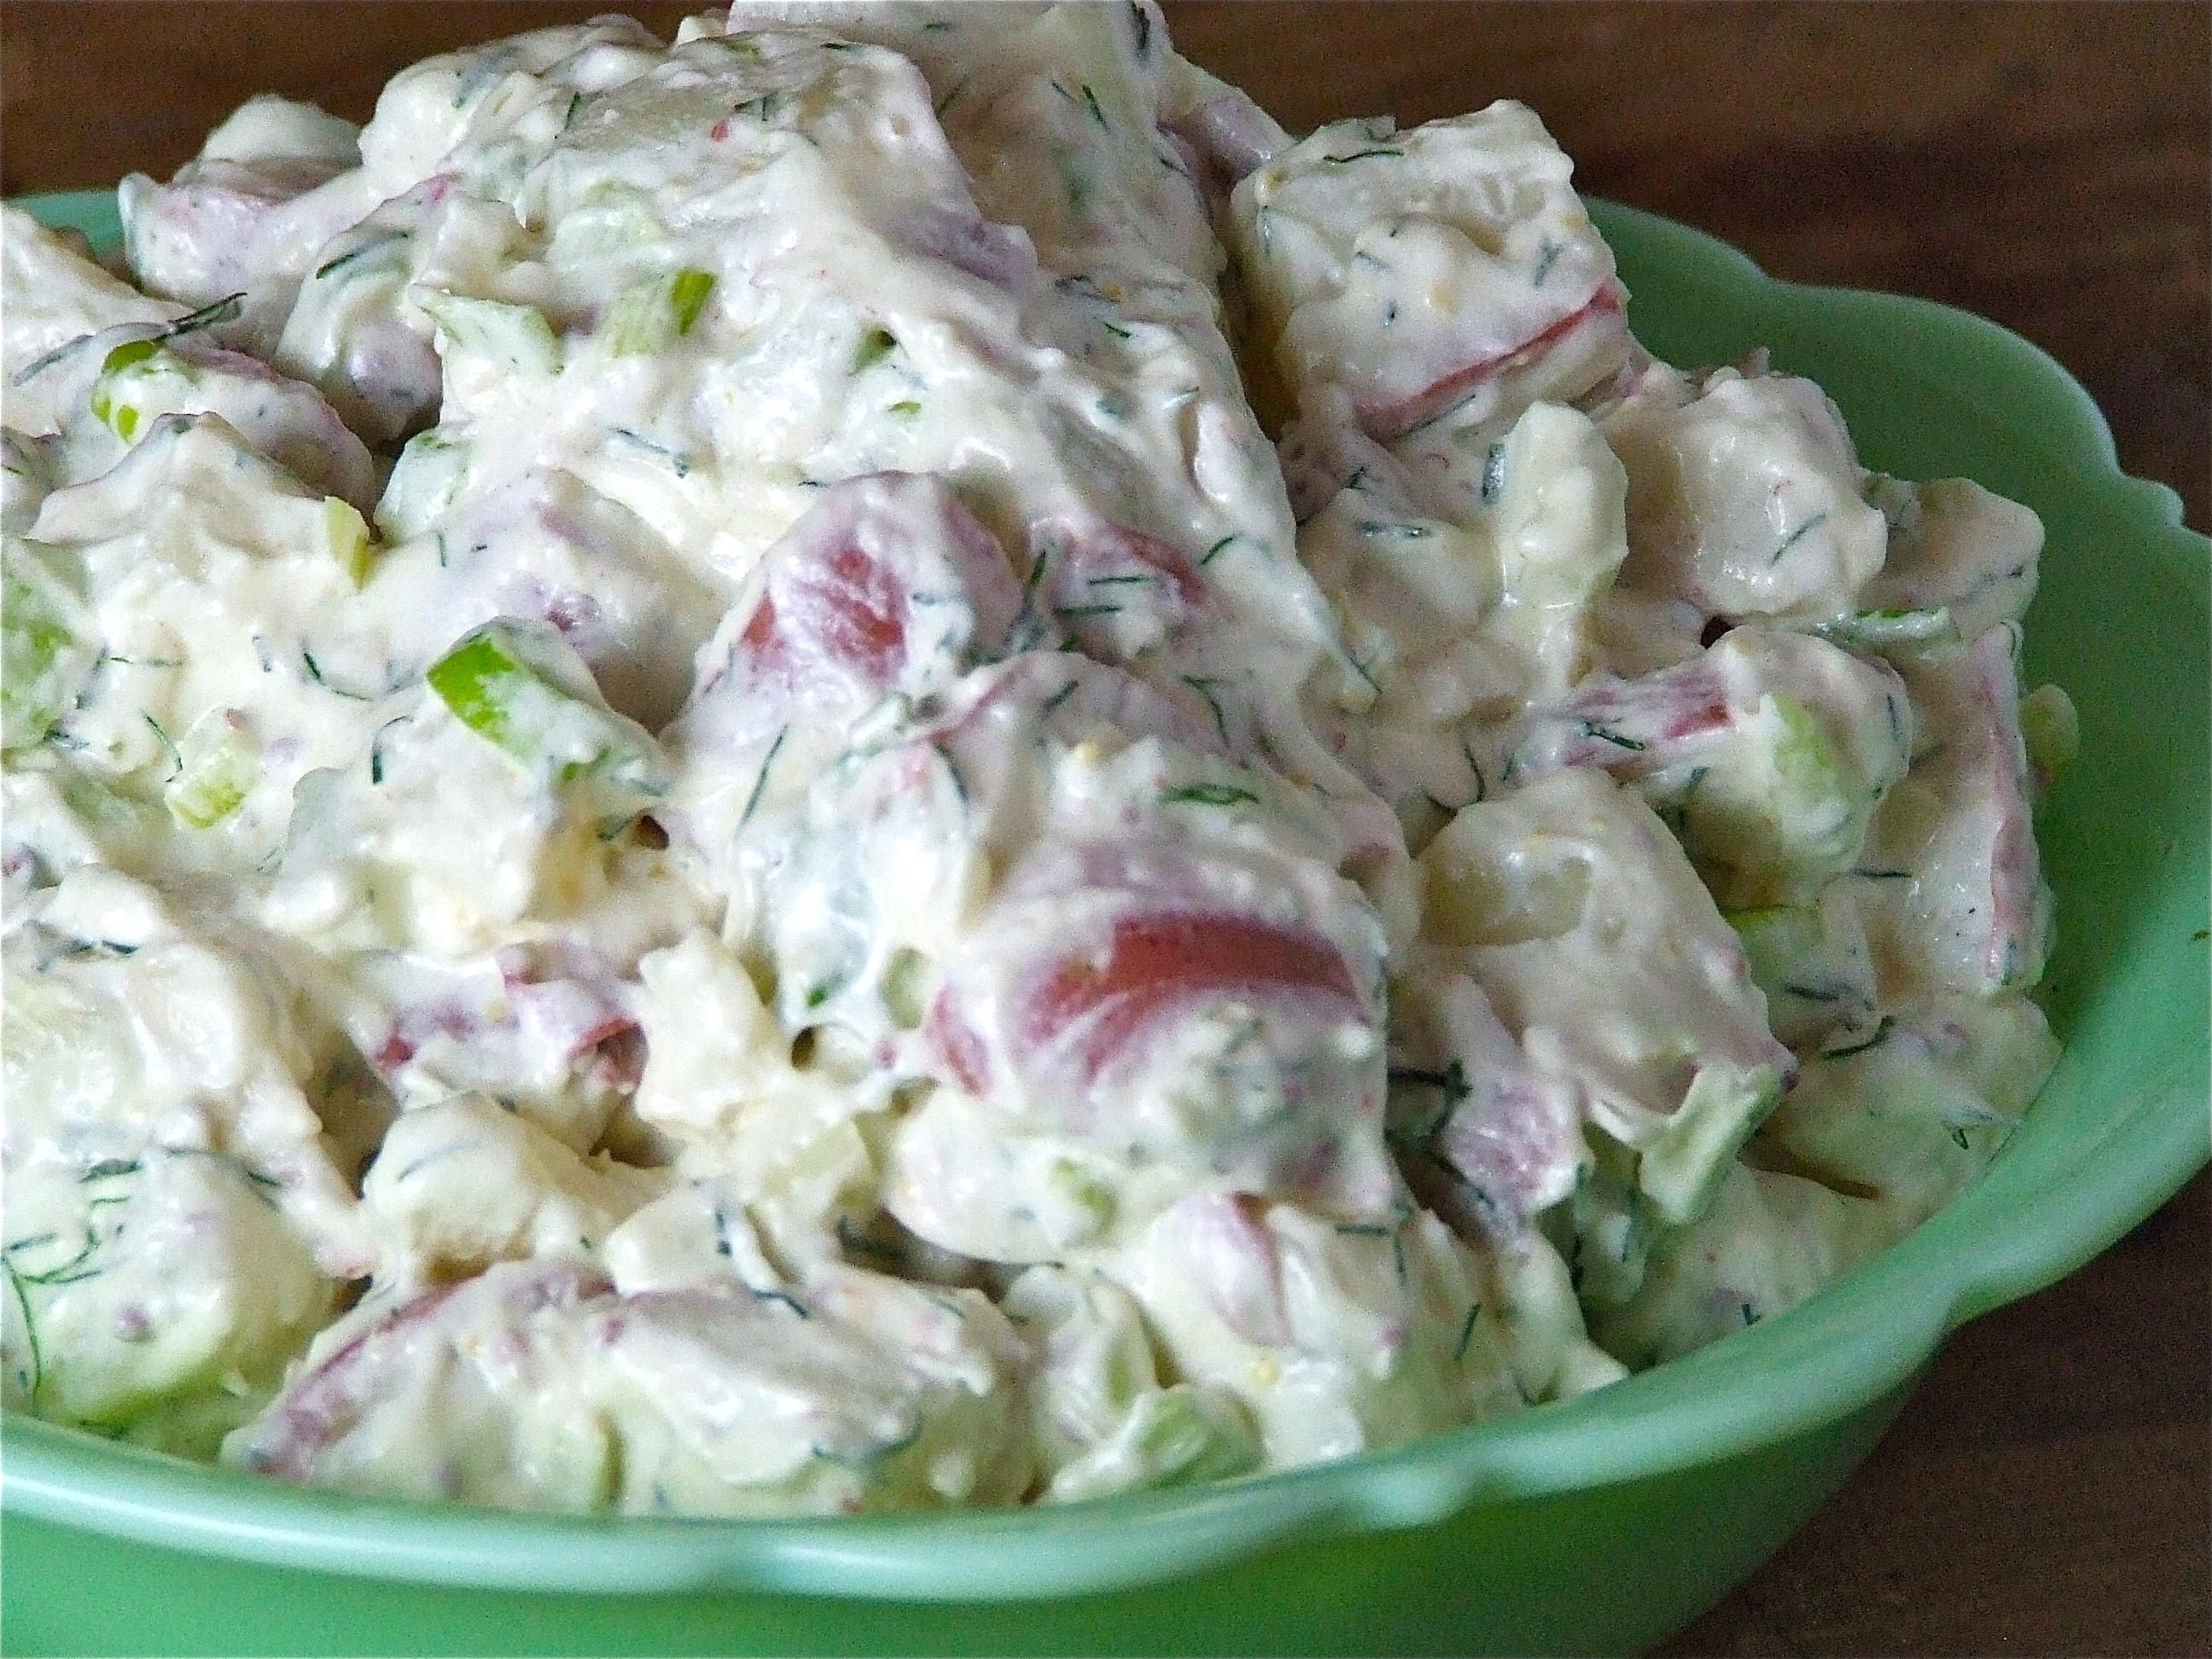 Potato Salad Recipe Without Eggs